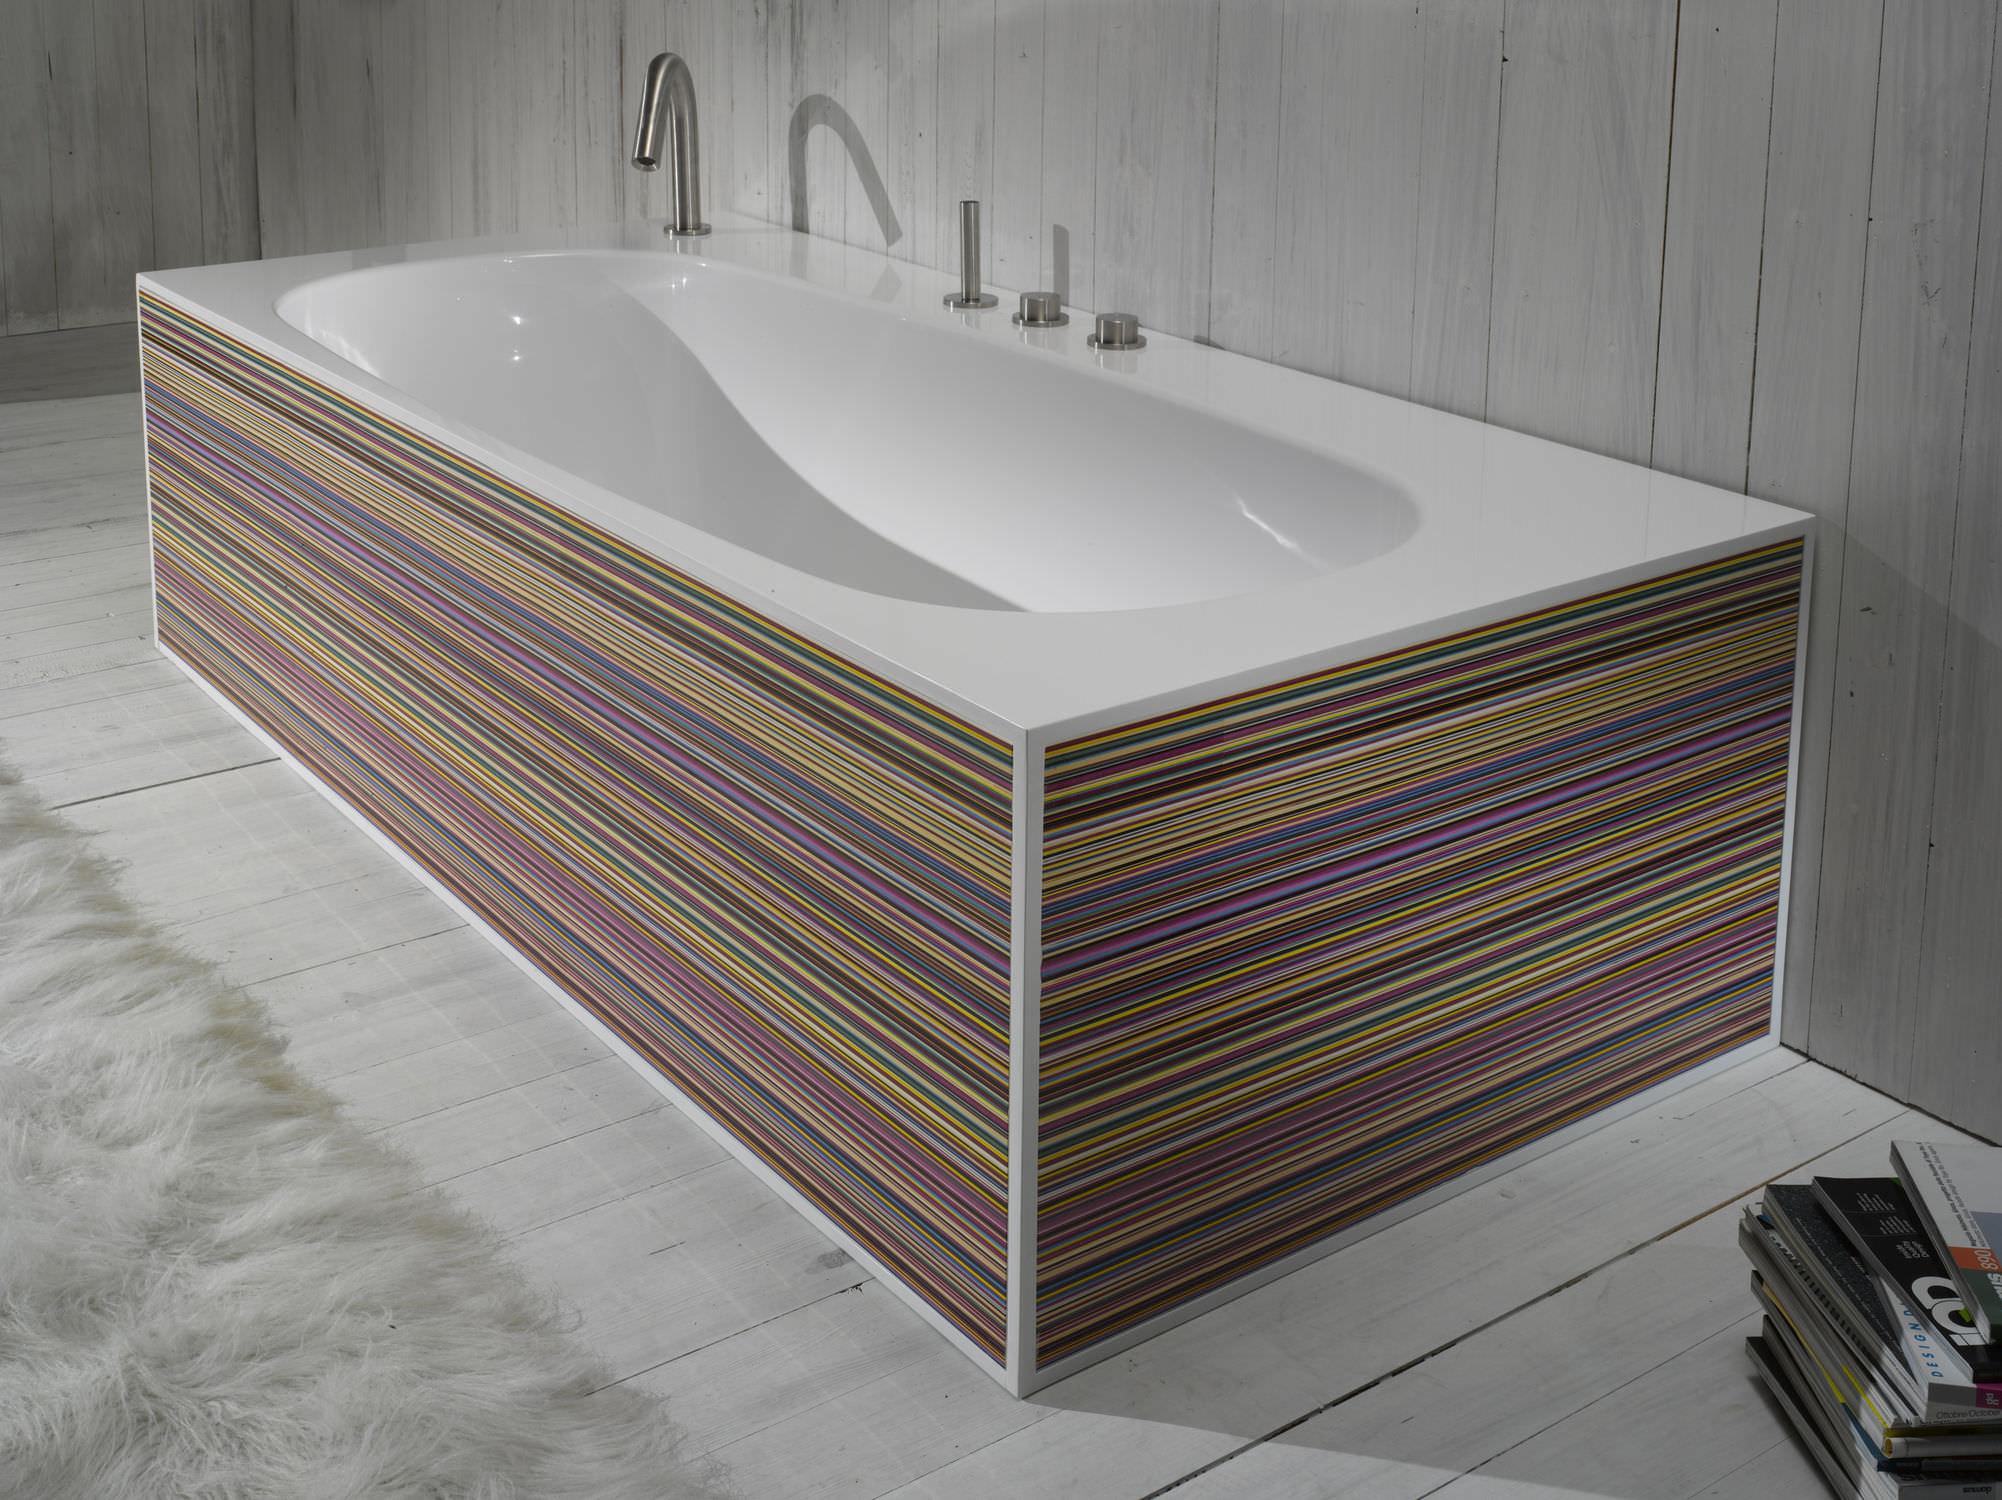 Vasca Da Bagno In Resina : Vasca da bagno ad isola in resina acrilica cover a. e t. italia